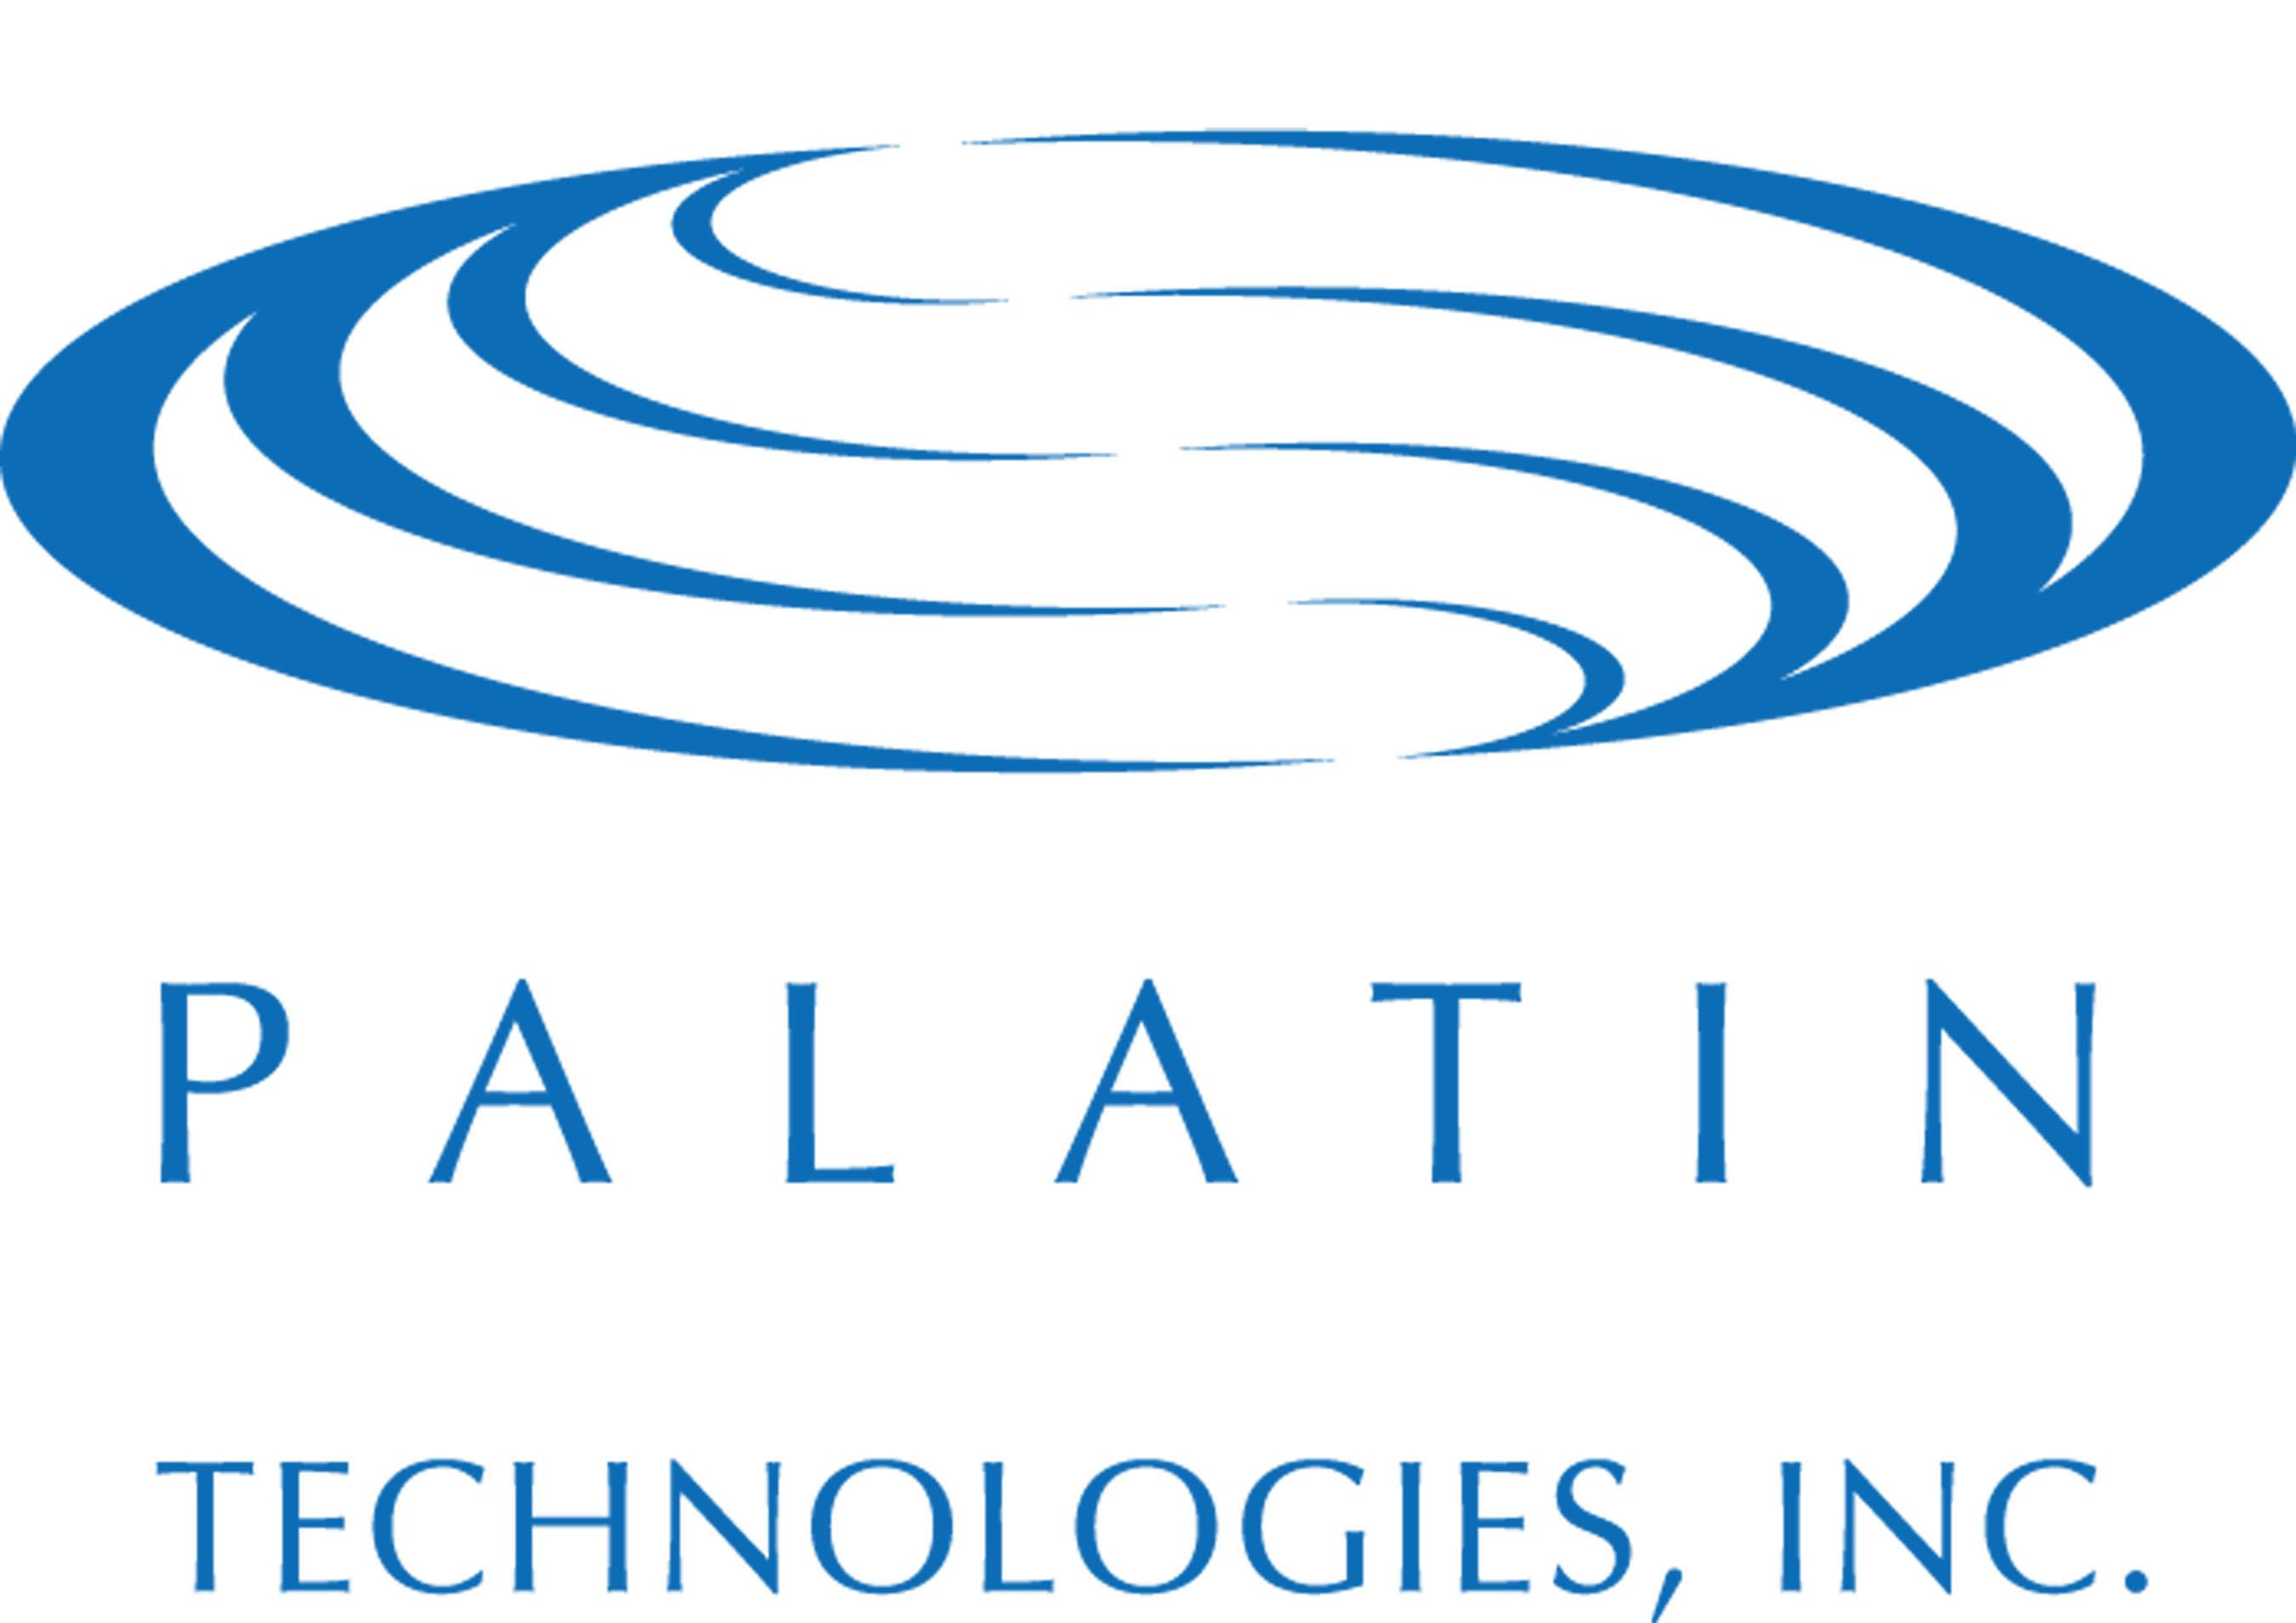 Palatin Technologies